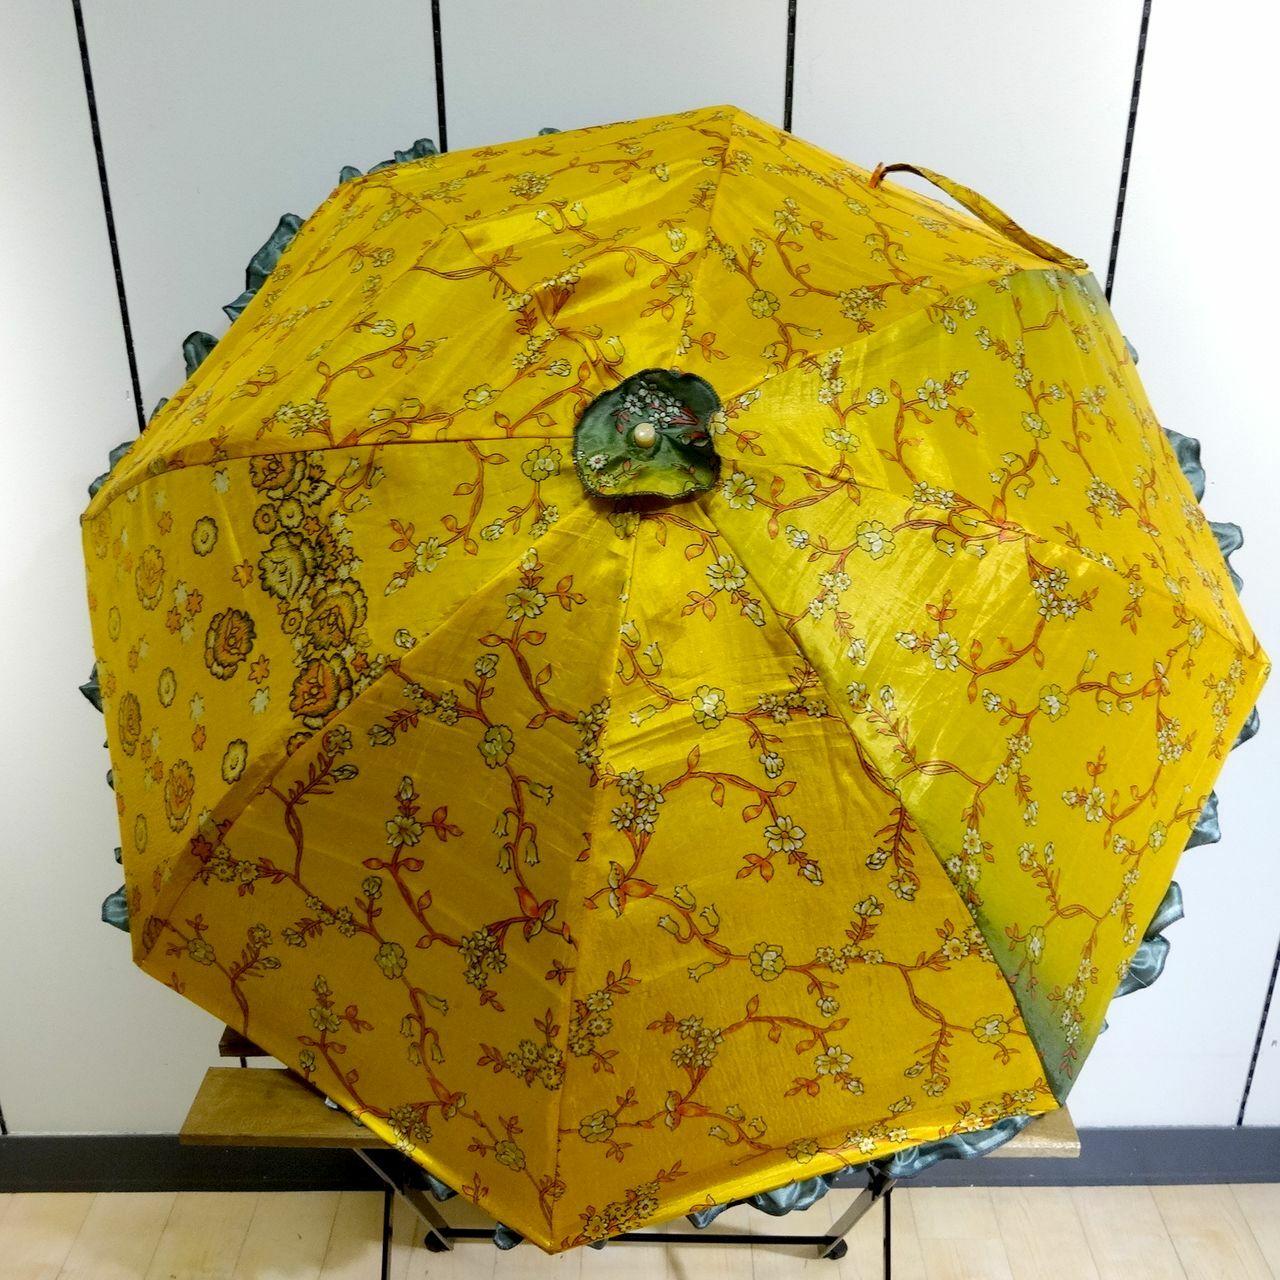 saripn-004 新型シルクサリー パラソルカバー【イエローブロッサム】折畳傘本体・共布バッグ付き